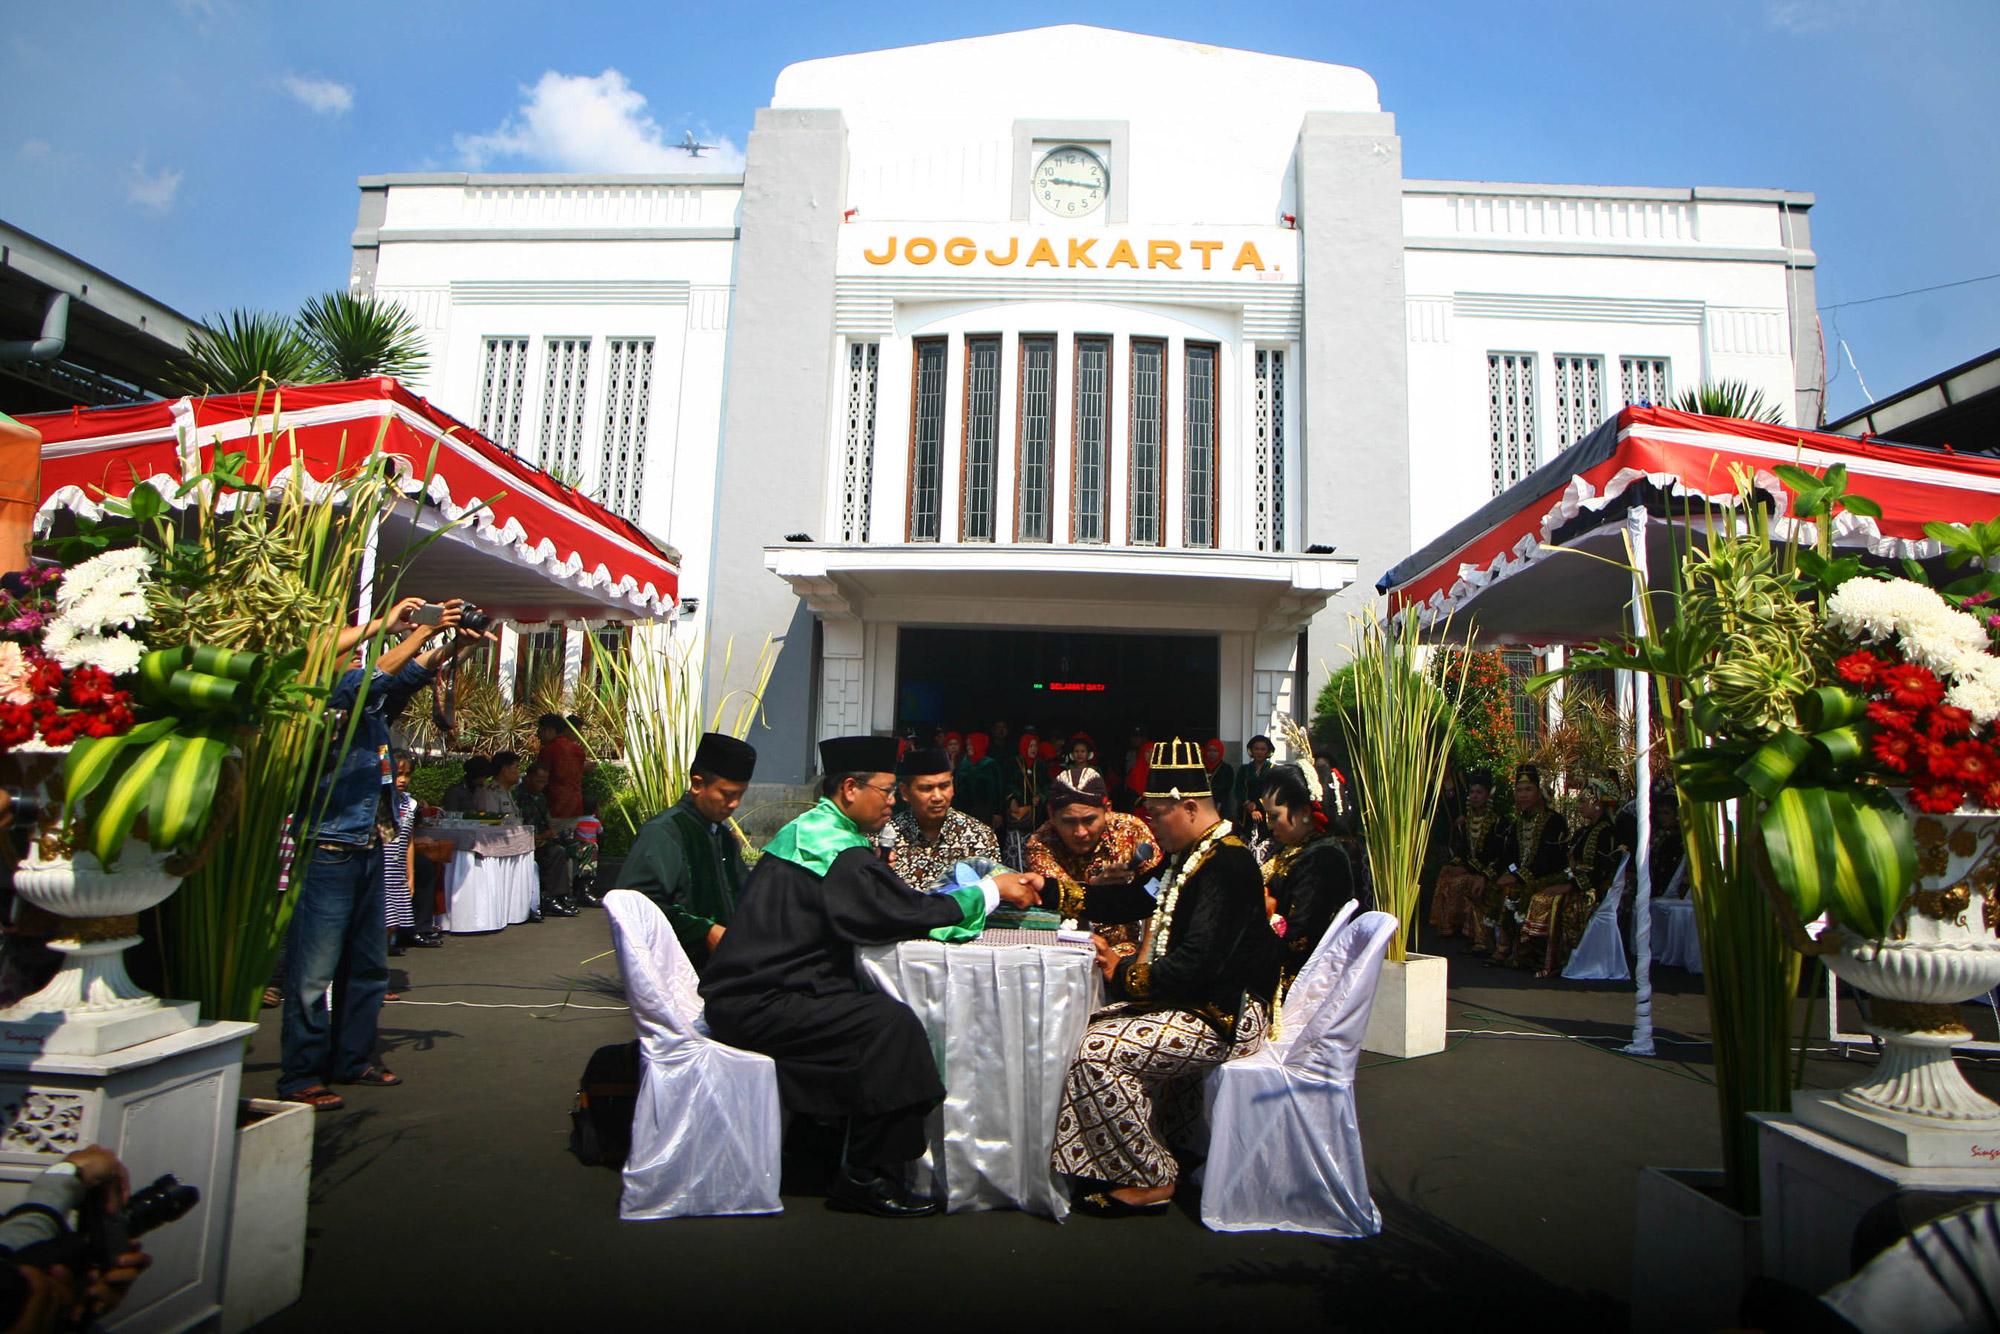 Mass wedding at Yogyakarta's Tugu Station